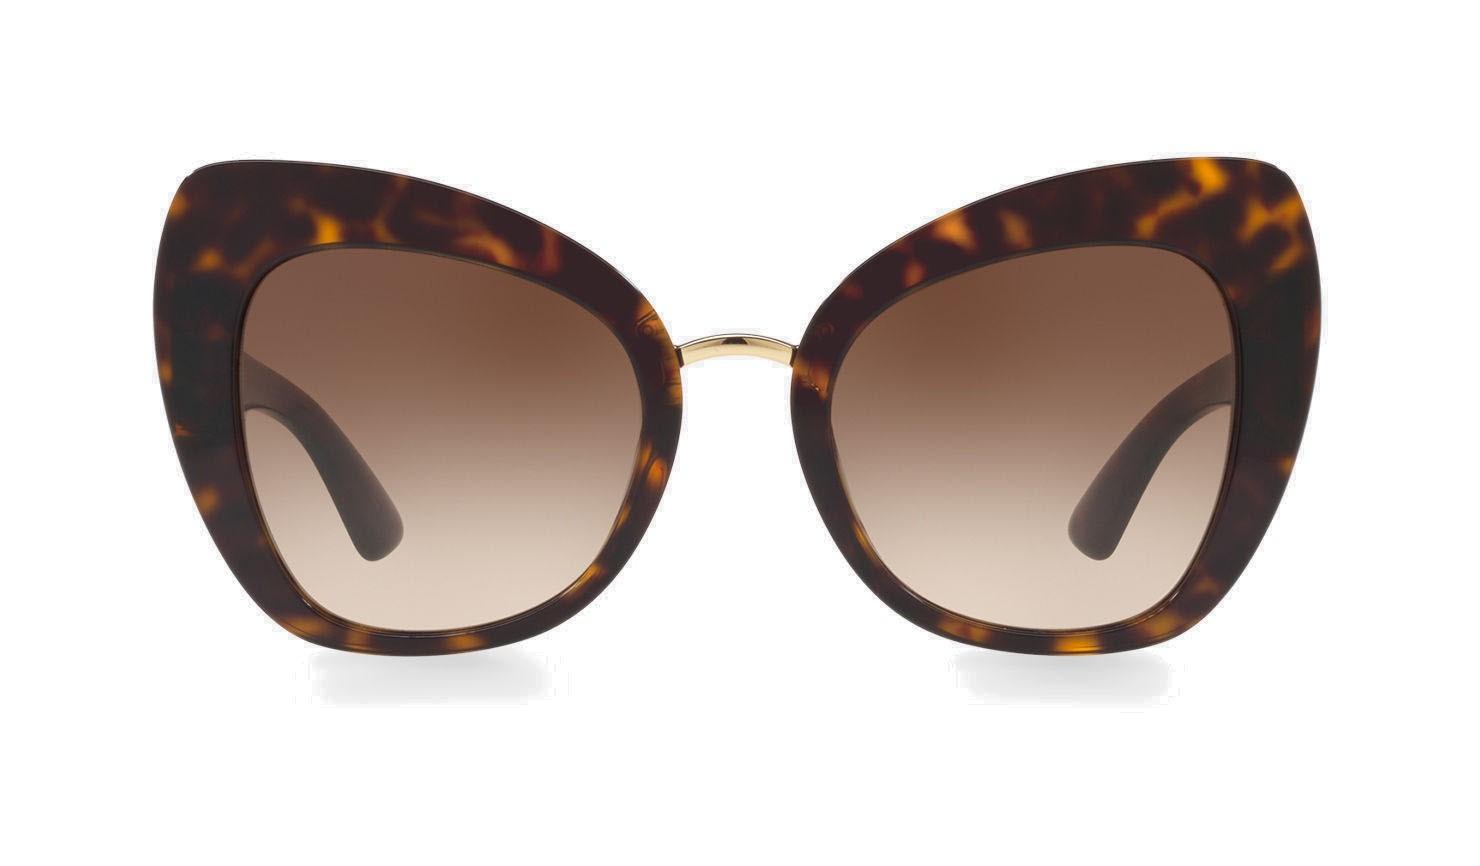 4bdd7a2b8d306 Dolce   Gabbana - Butterfly Sunglasses in Acetate - Havana - Dolce   Gabbana  Eyewear